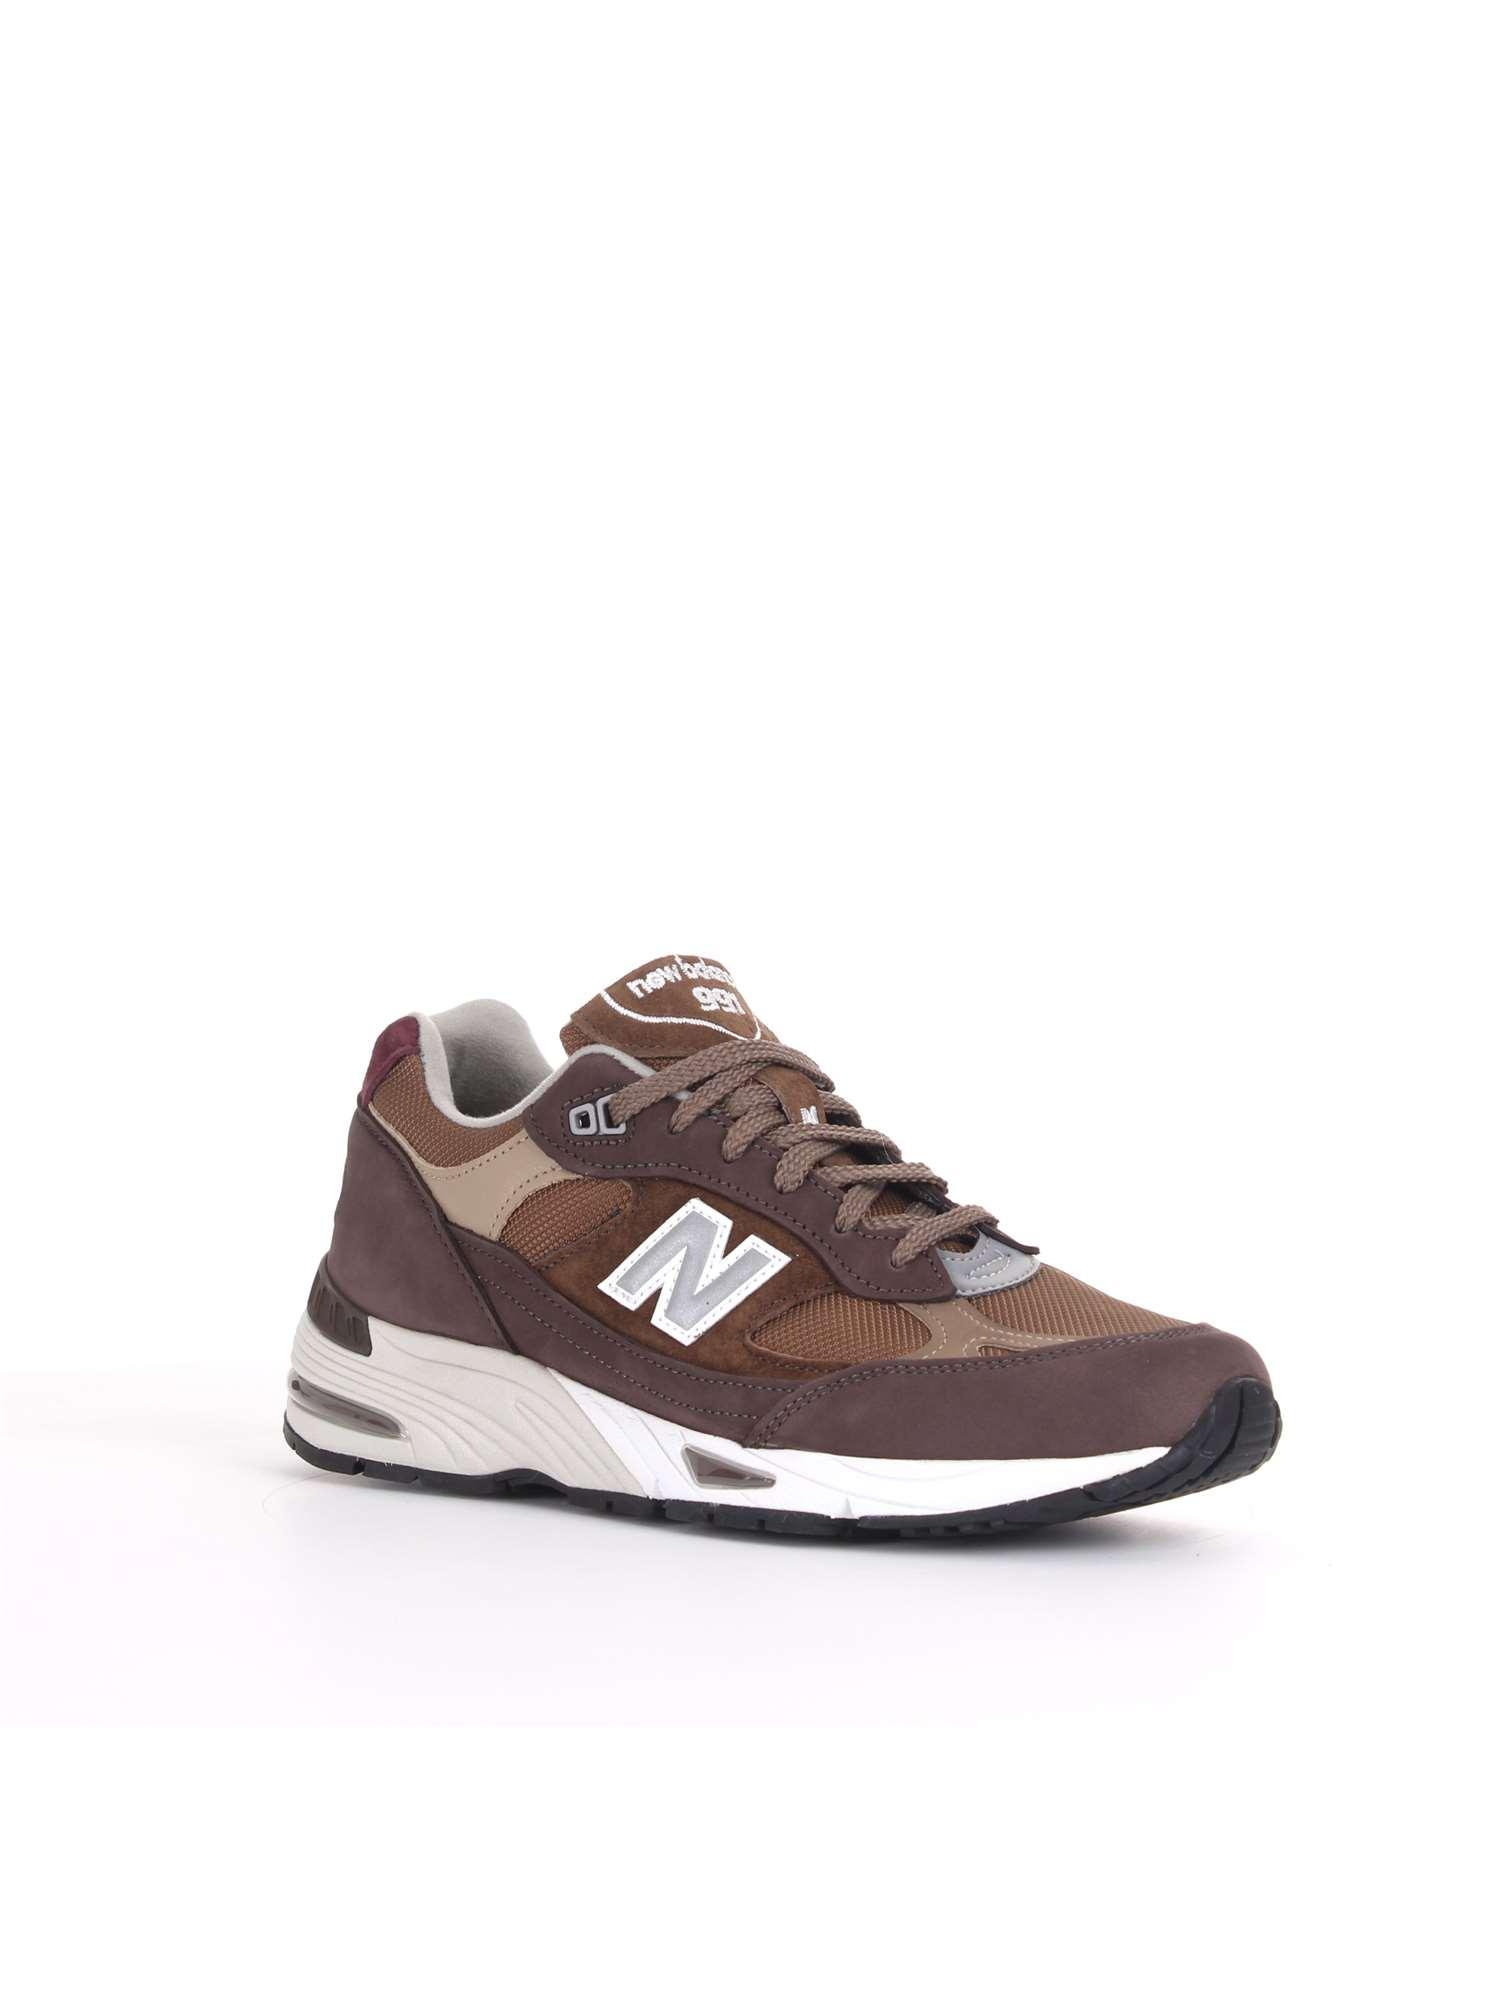 New Balance Mann NBM991NGG NBM991NGG NBM991NGG braun-672 Turnschuhe Herbst Winter  8e12a0